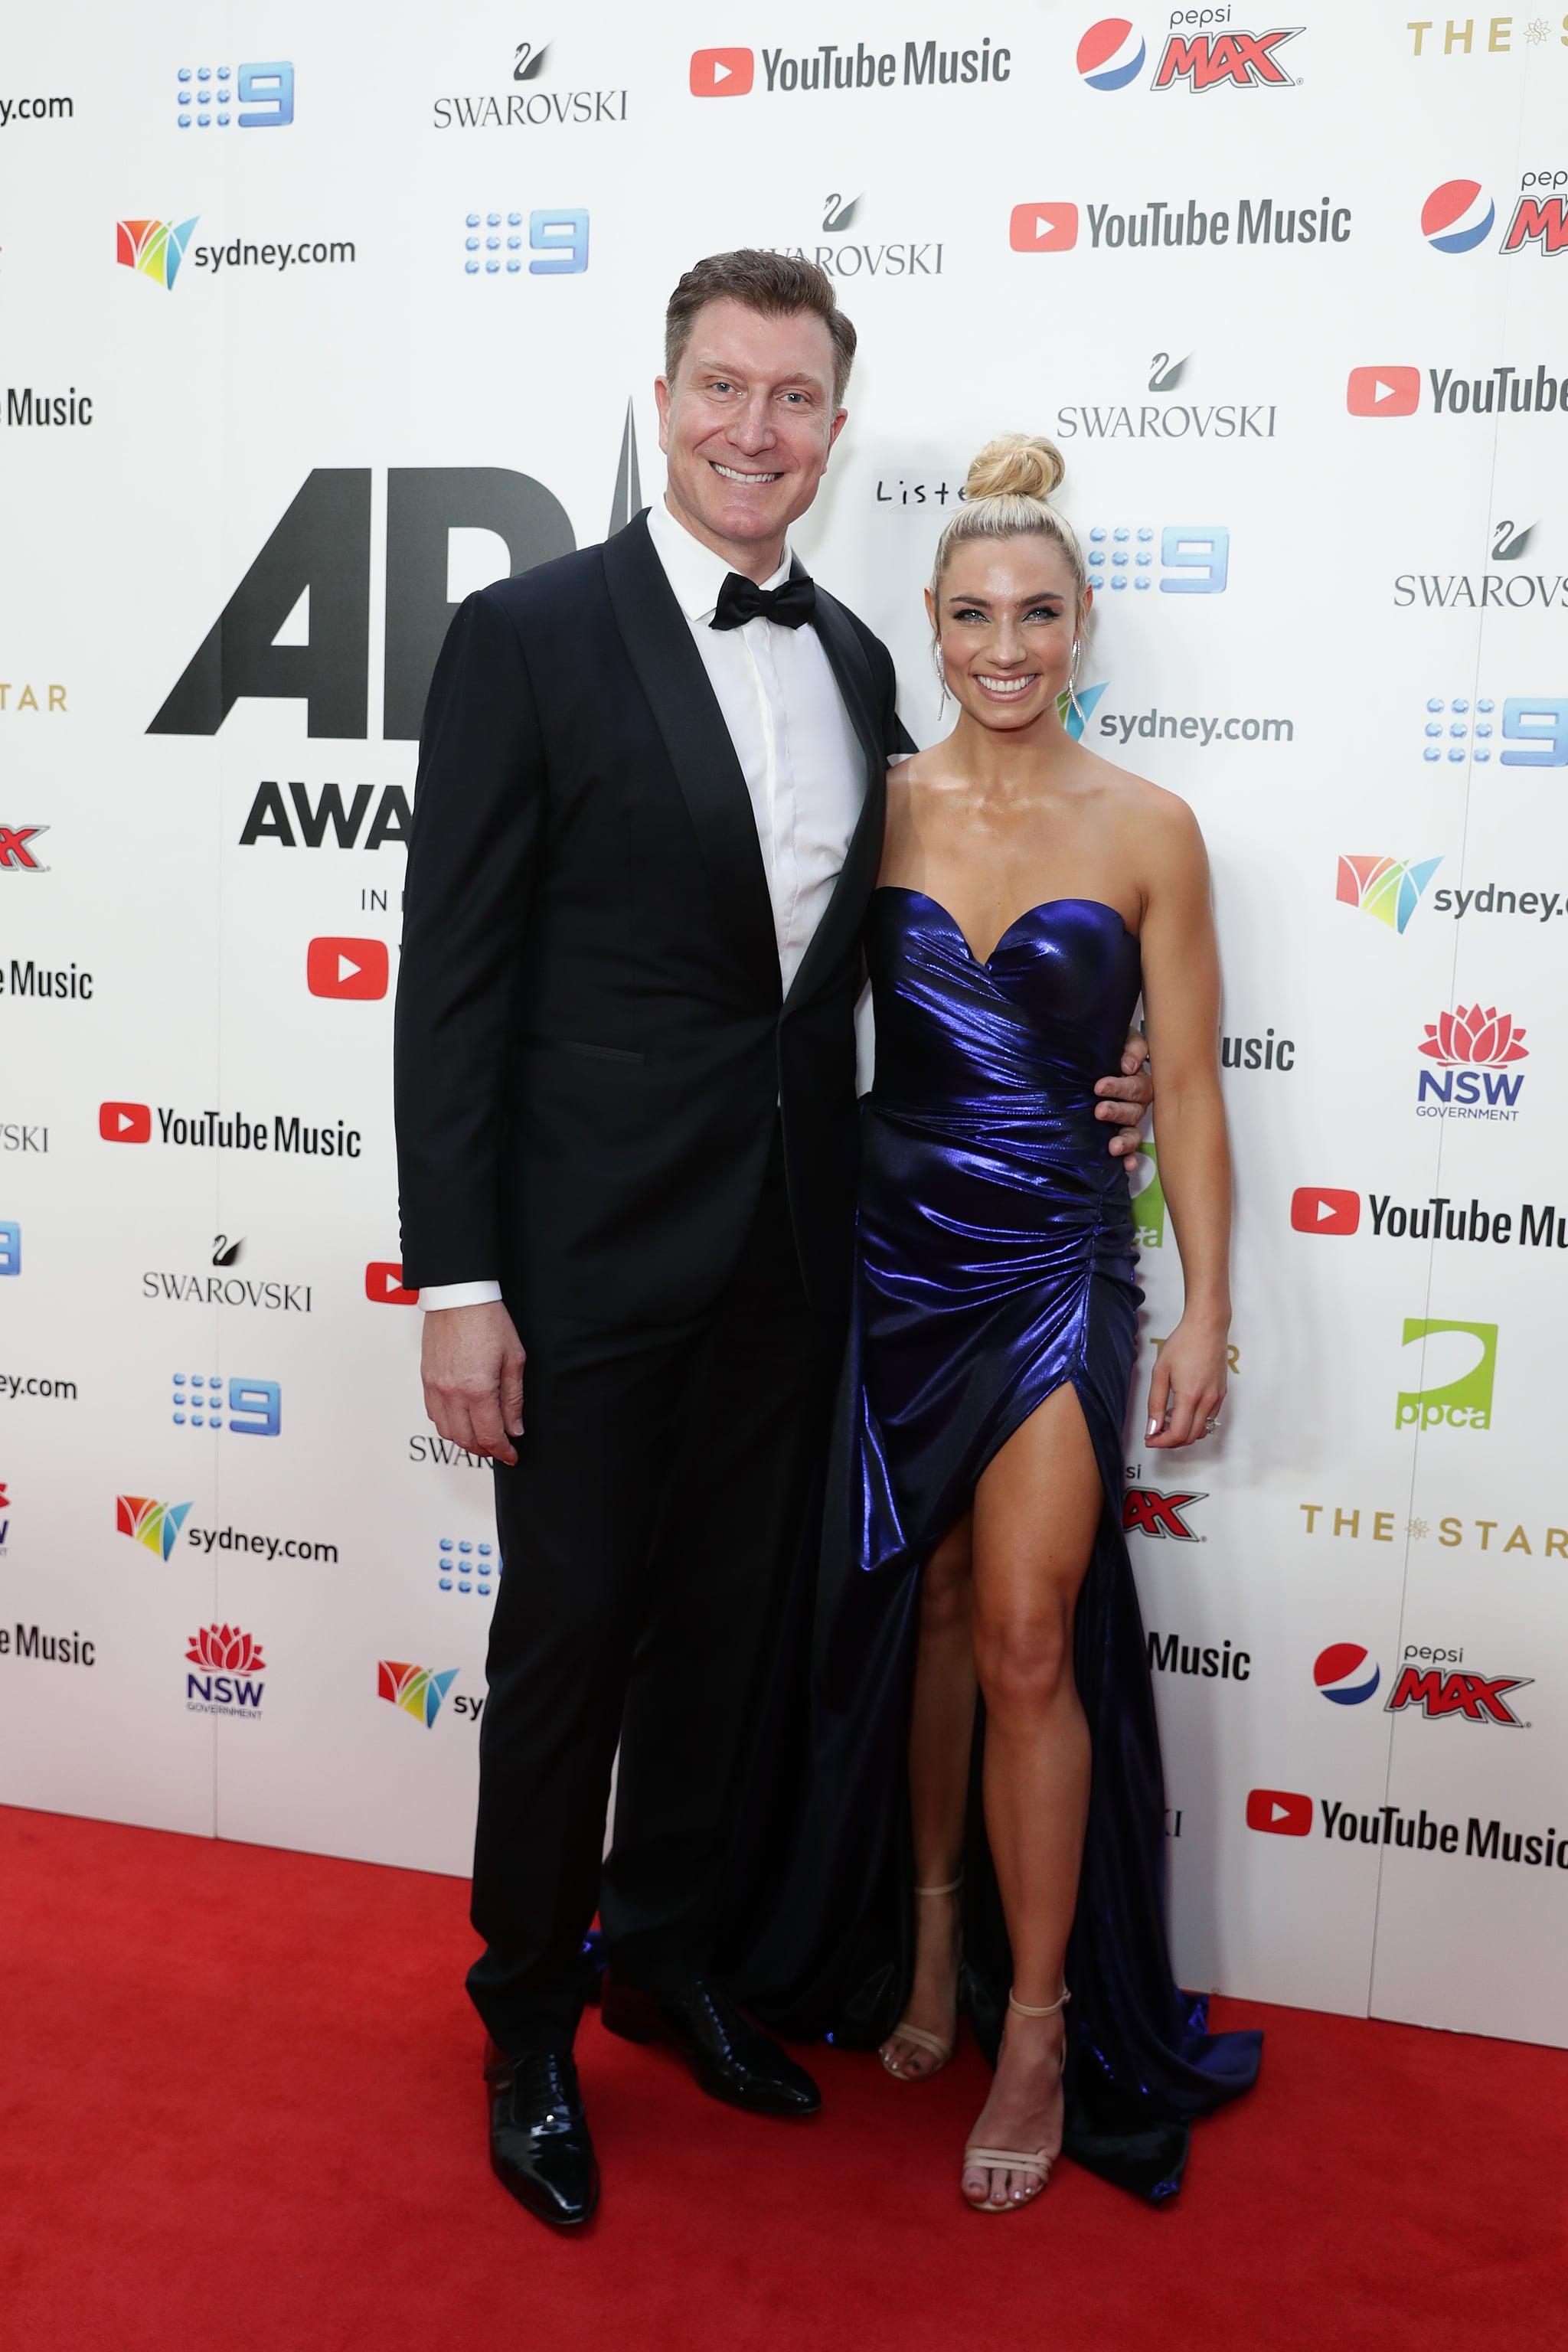 Simon Pryce And Lauren Hannaford 2019 Arias Red Carpet Photos Popsugar Celebrity Australia Photo 10